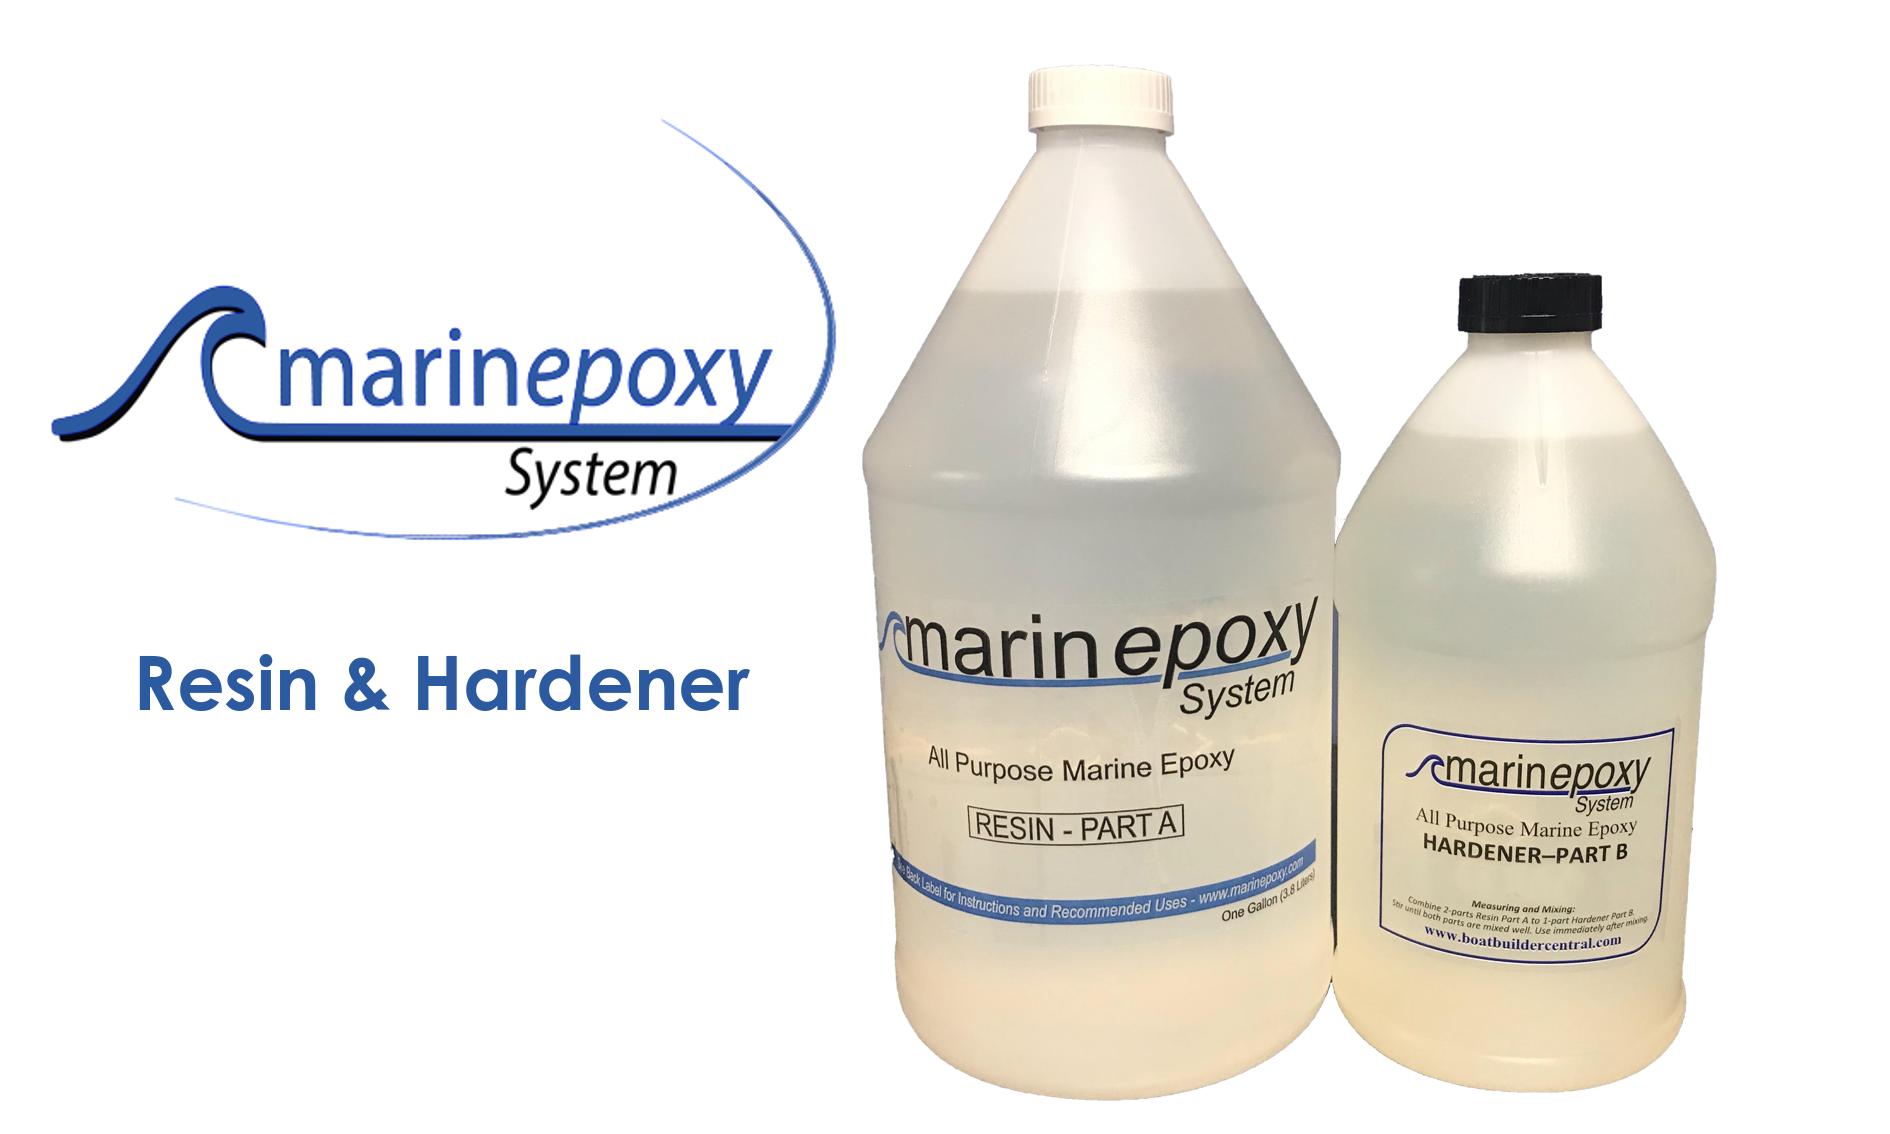 Marinepoxy